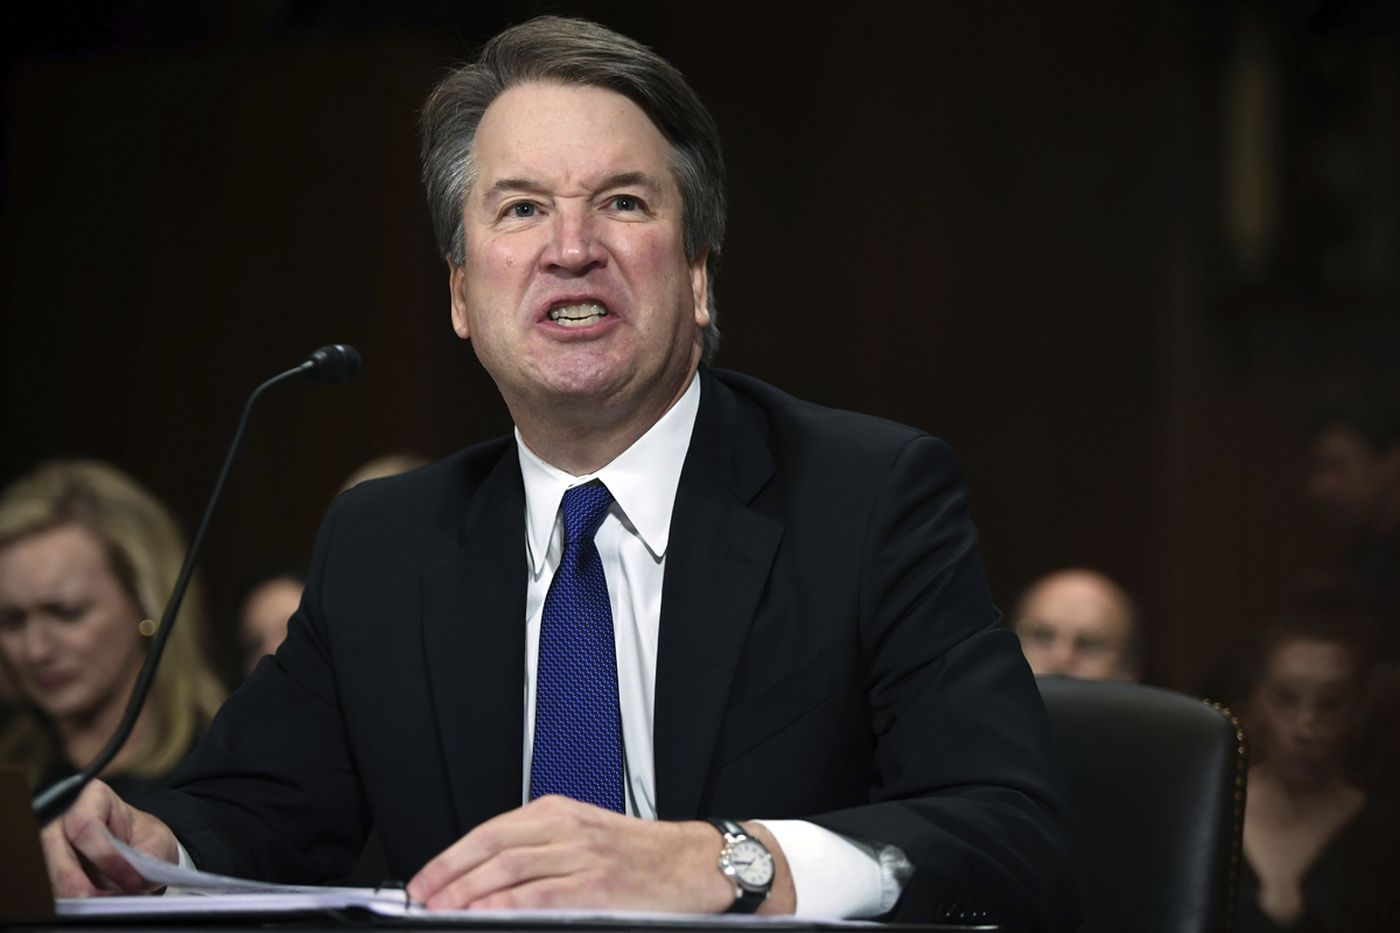 Brett Kavanaugh, Christine Blasey Ford testify in historic Senate hearing: Recap